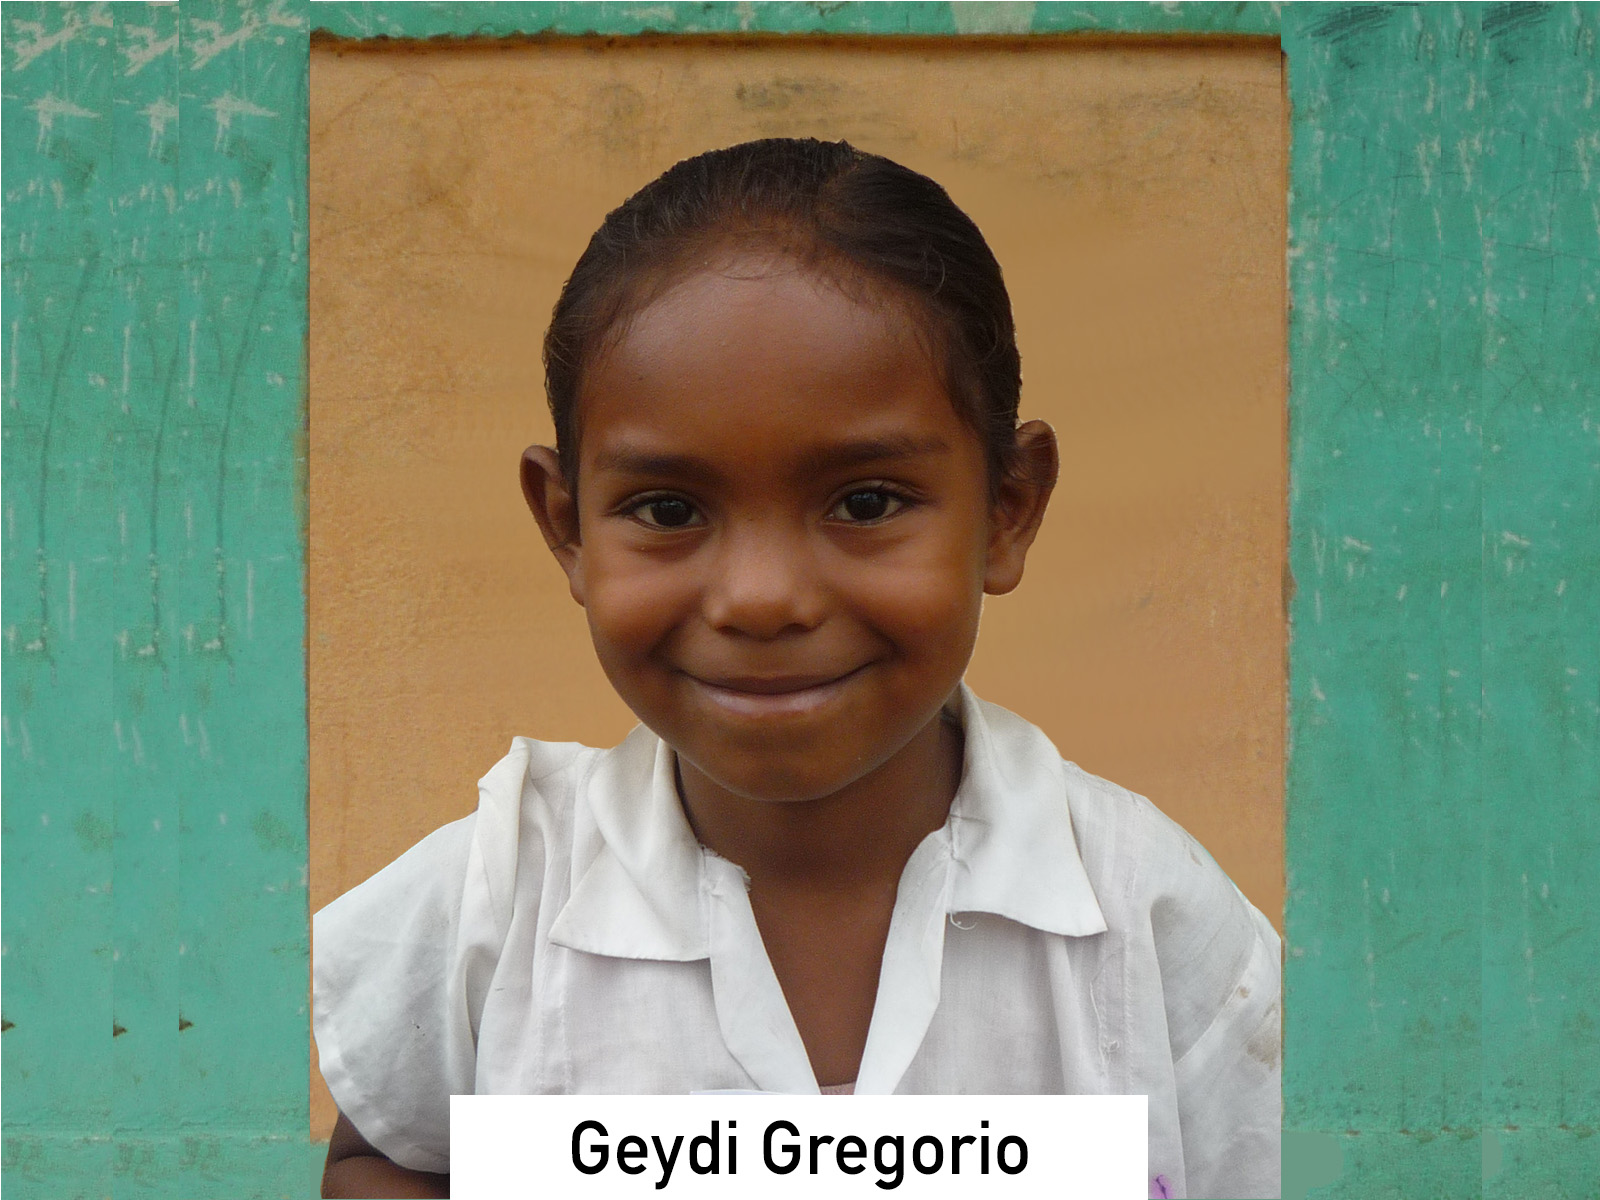 016 - Geydi Gregorio.jpg